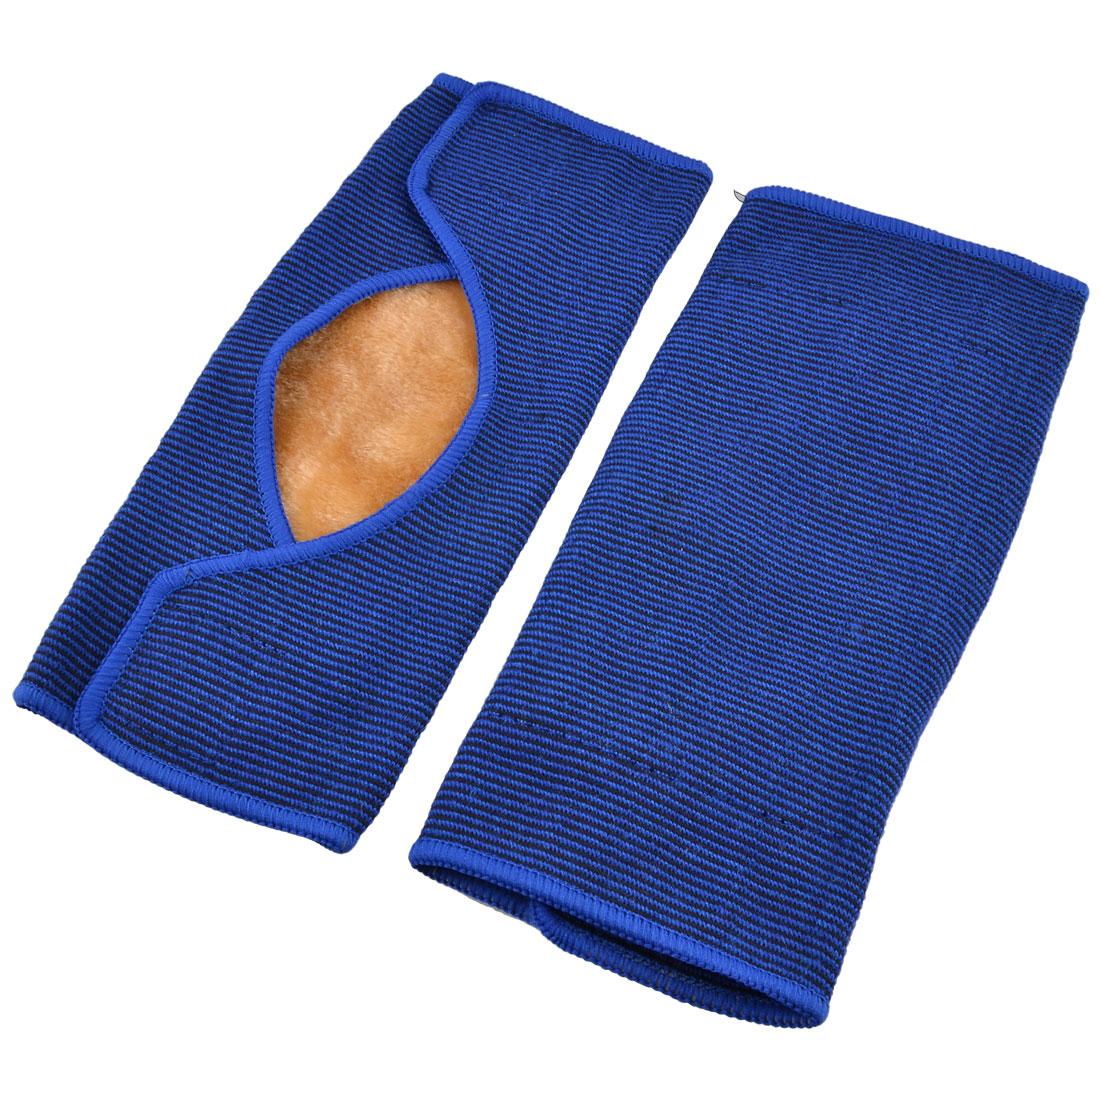 2Pcs Blue Black Stripe Plush Lined Elastic Knee Support